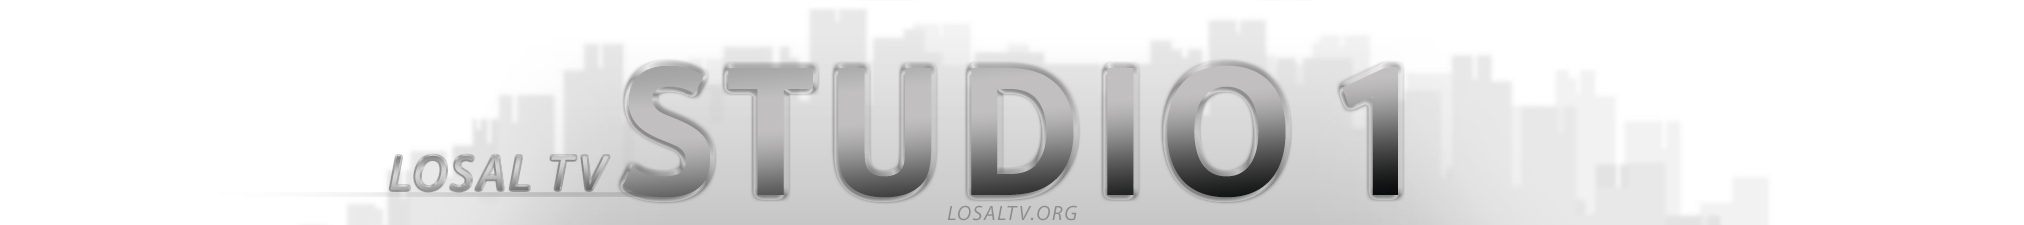 LATV STUDIO 1